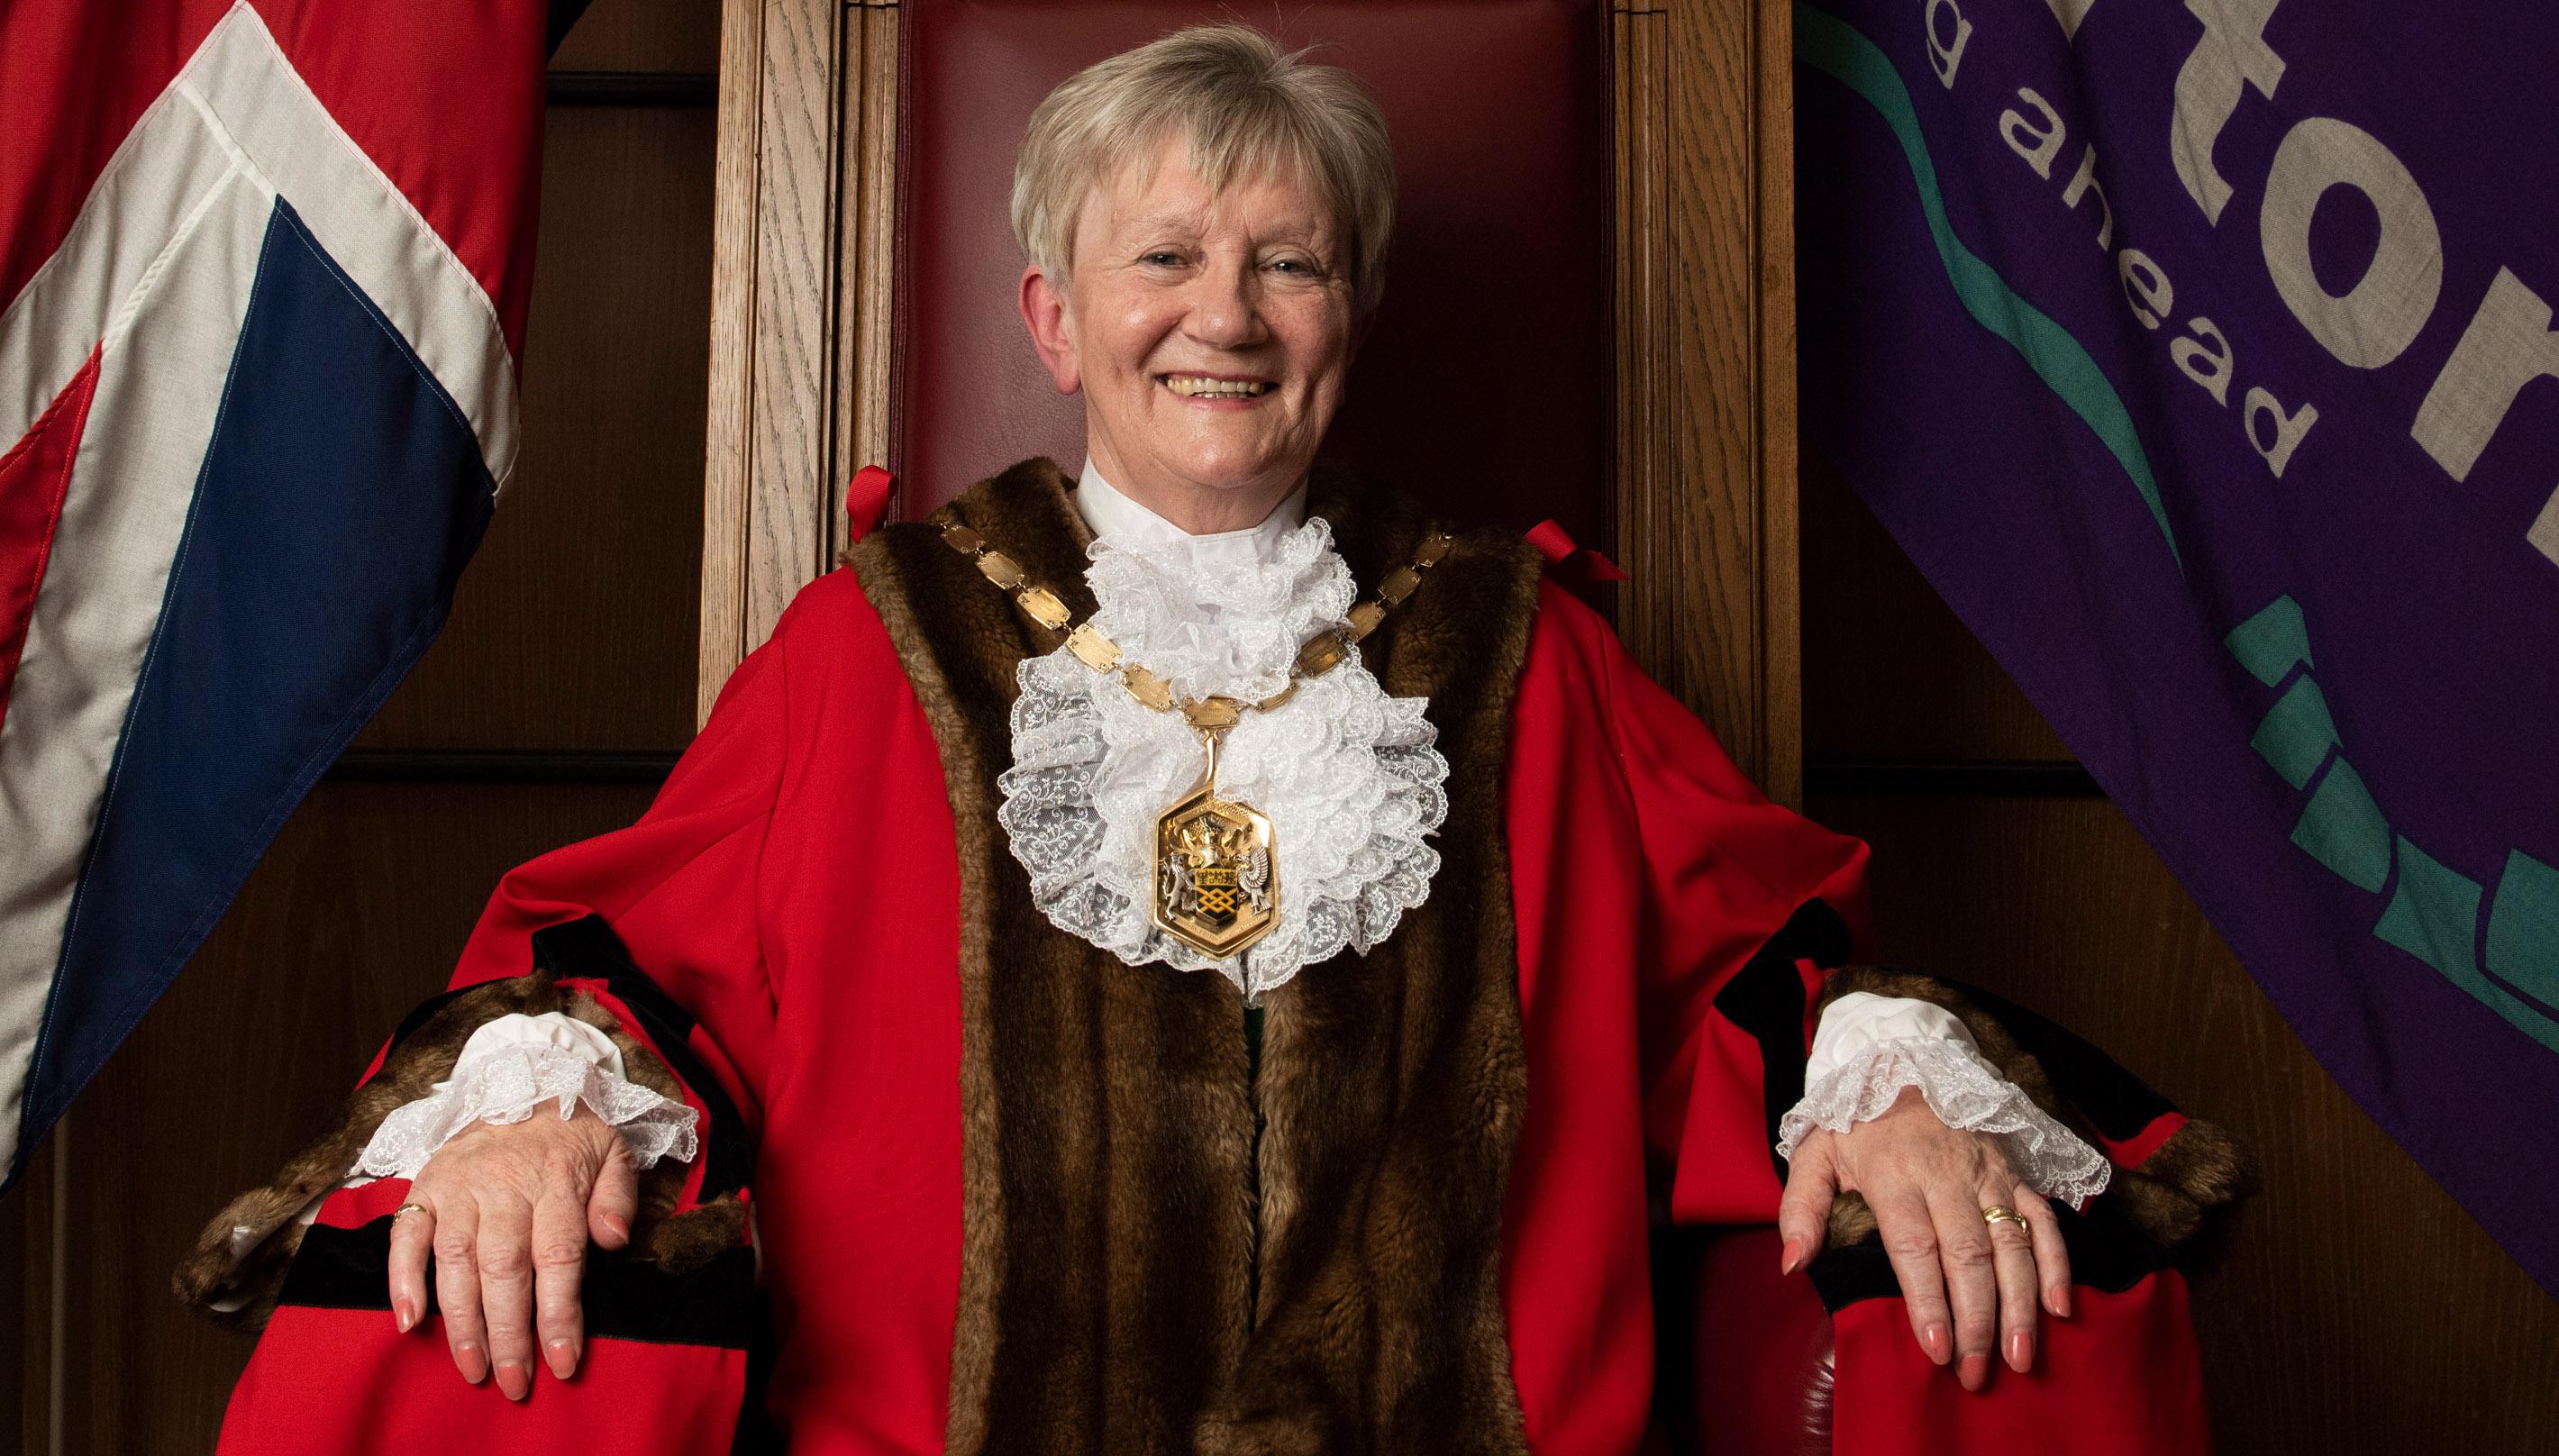 Mayor of London Borough of Merton Cllr Mary Curtin